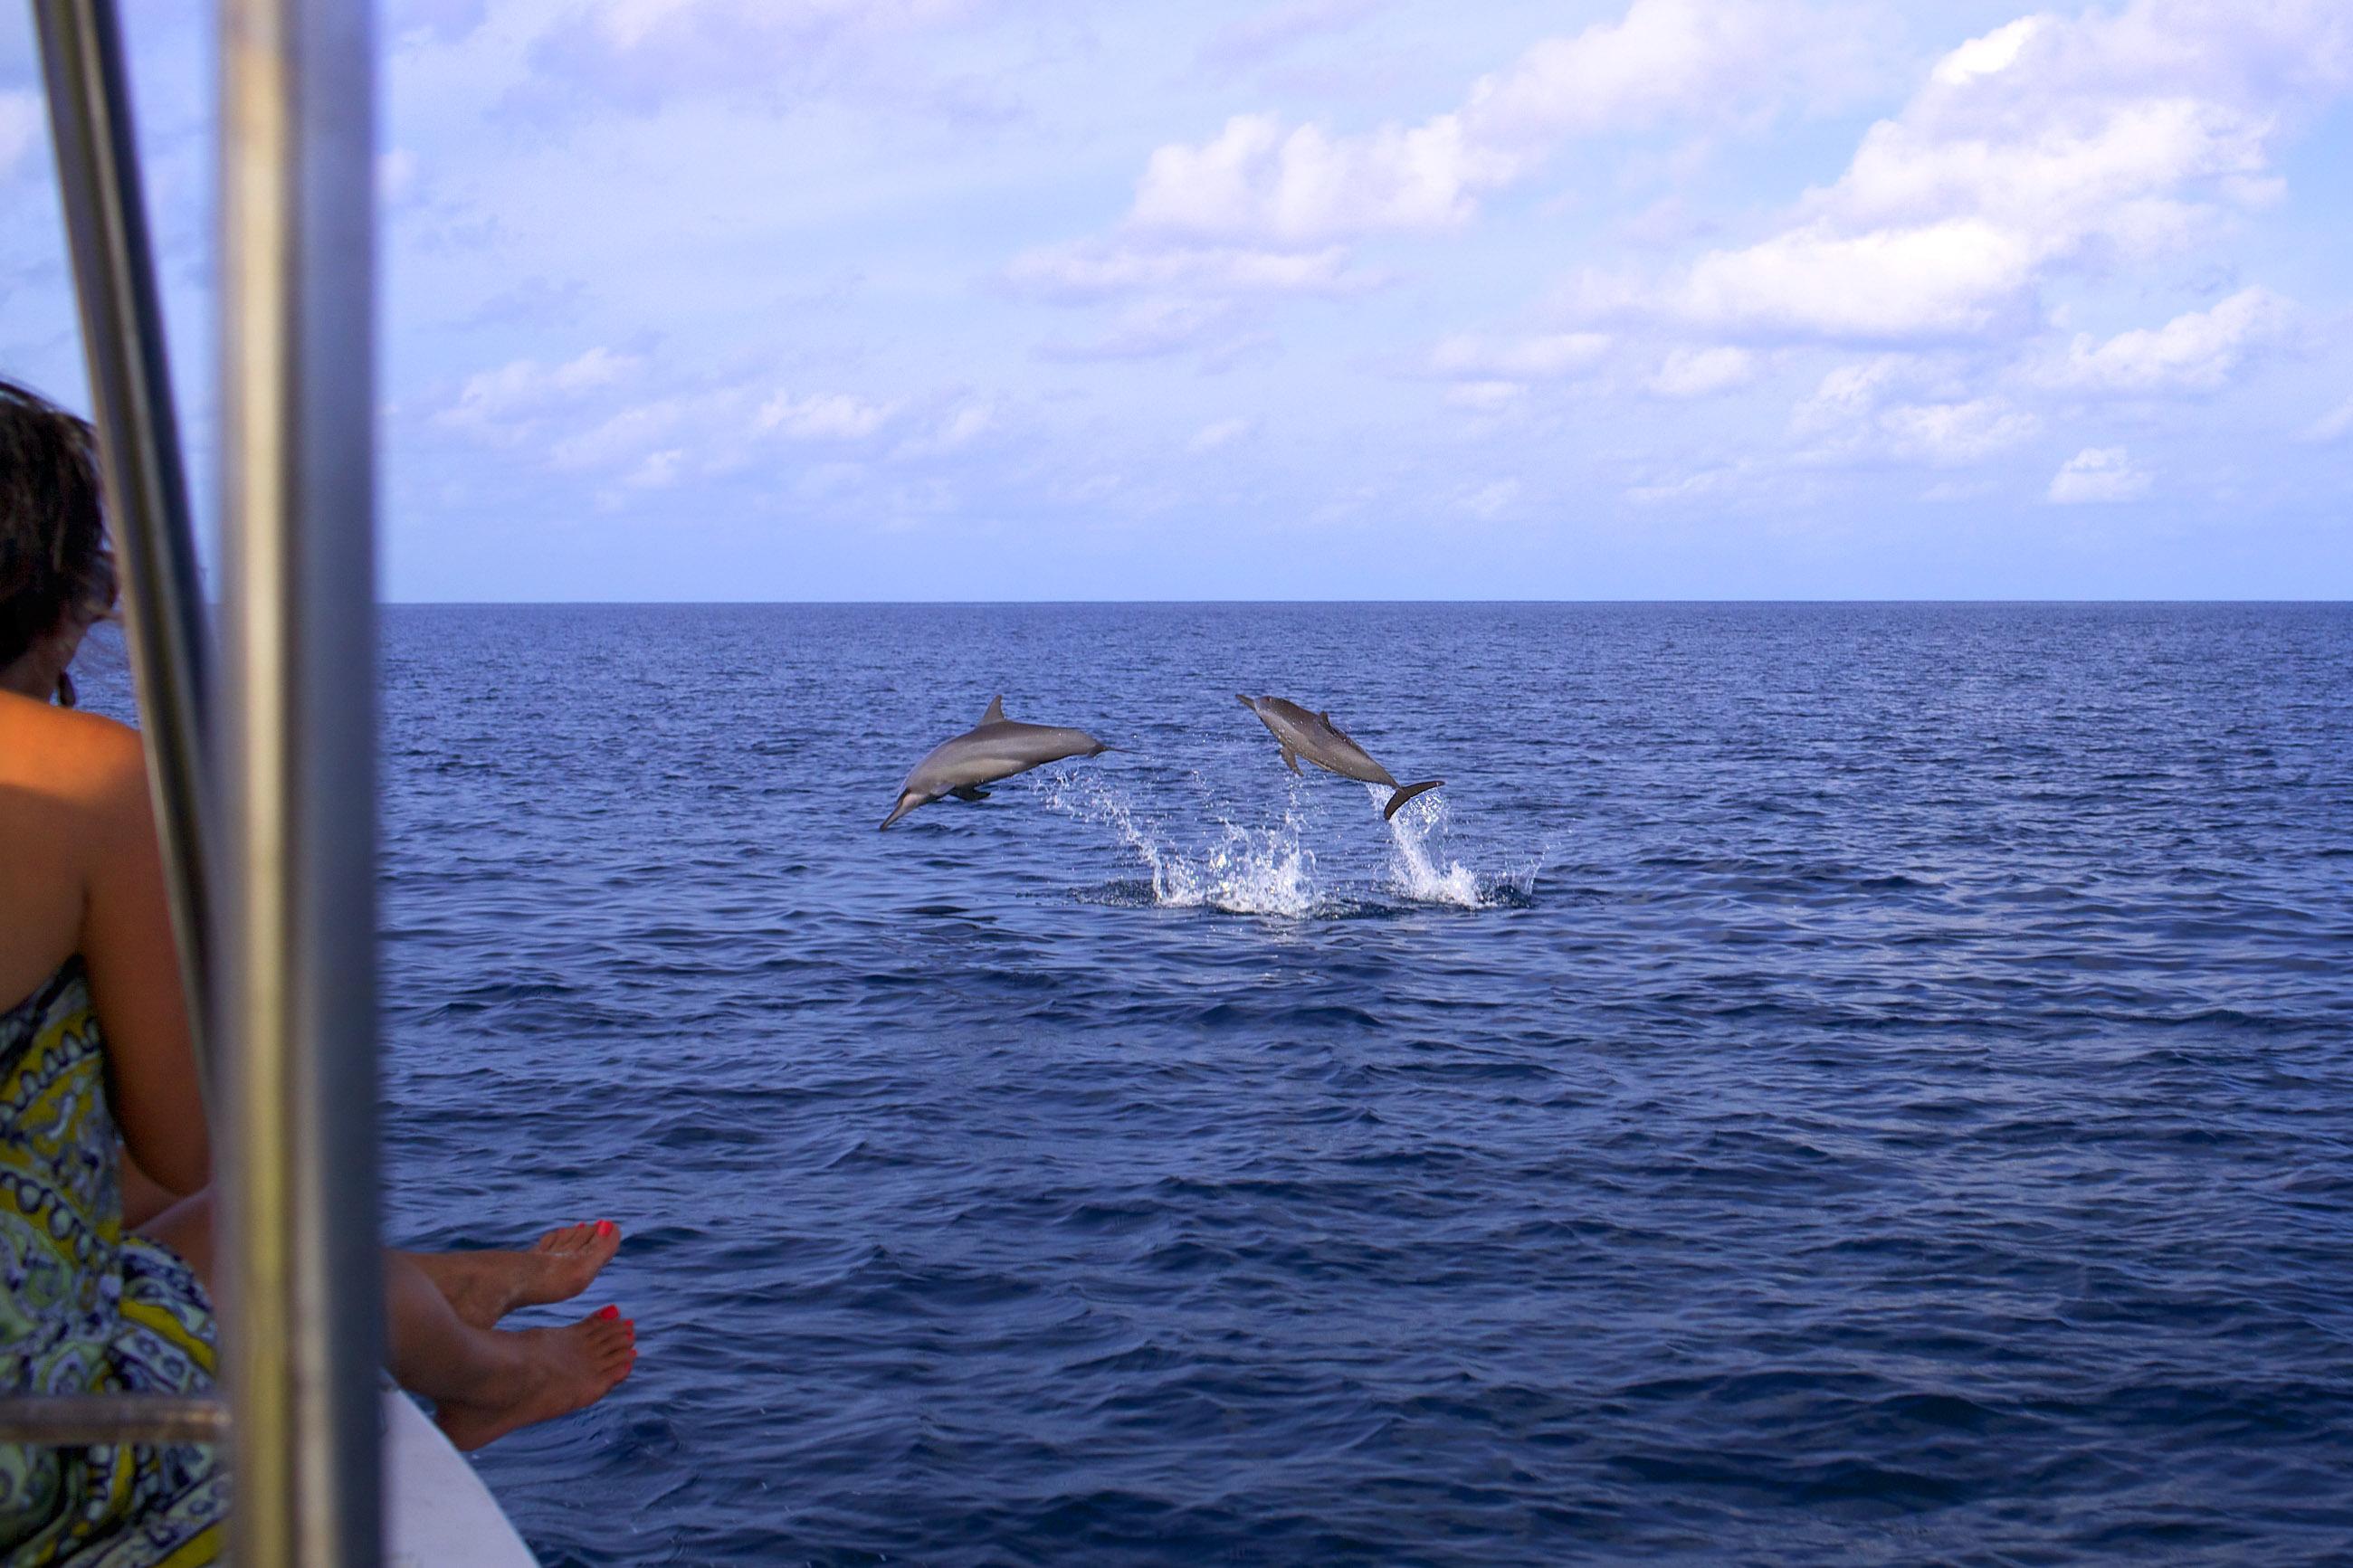 https://bubo.sk/uploads/galleries/7467/dolphin_cruise_2.jpg